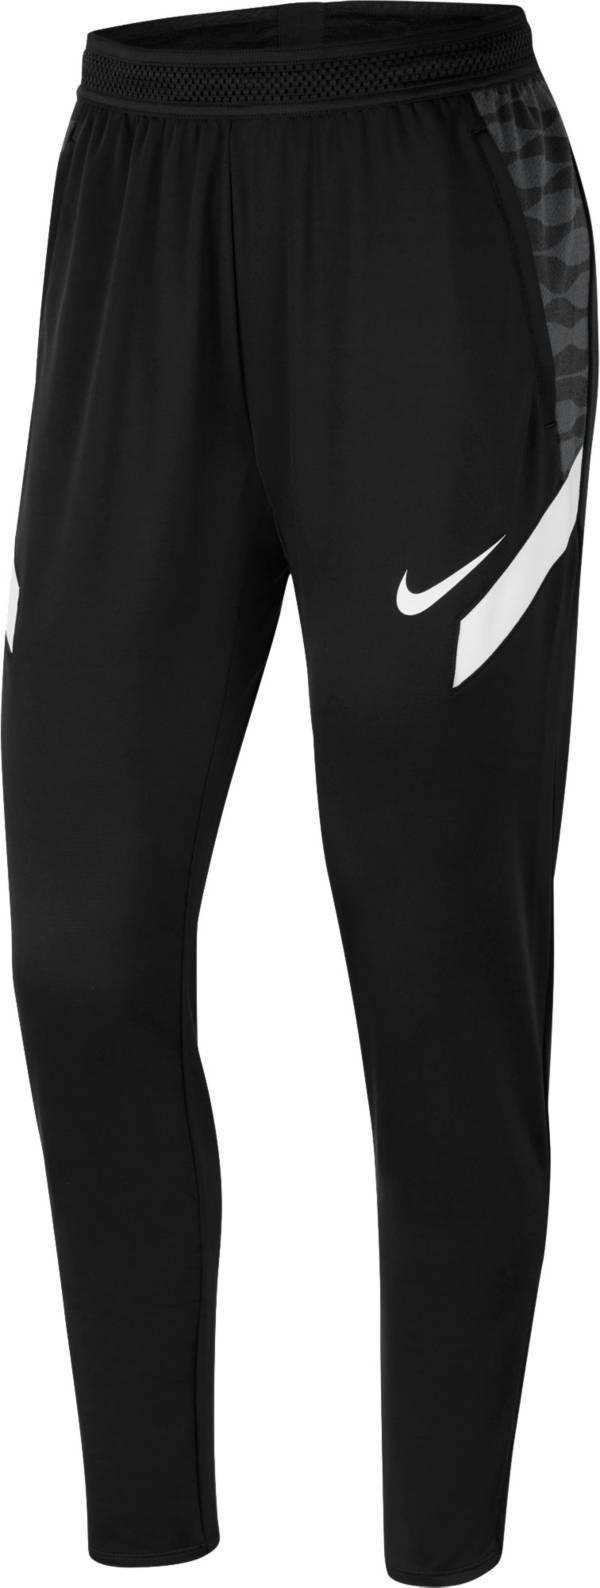 Nike Women's Strike Soccer Pants product image